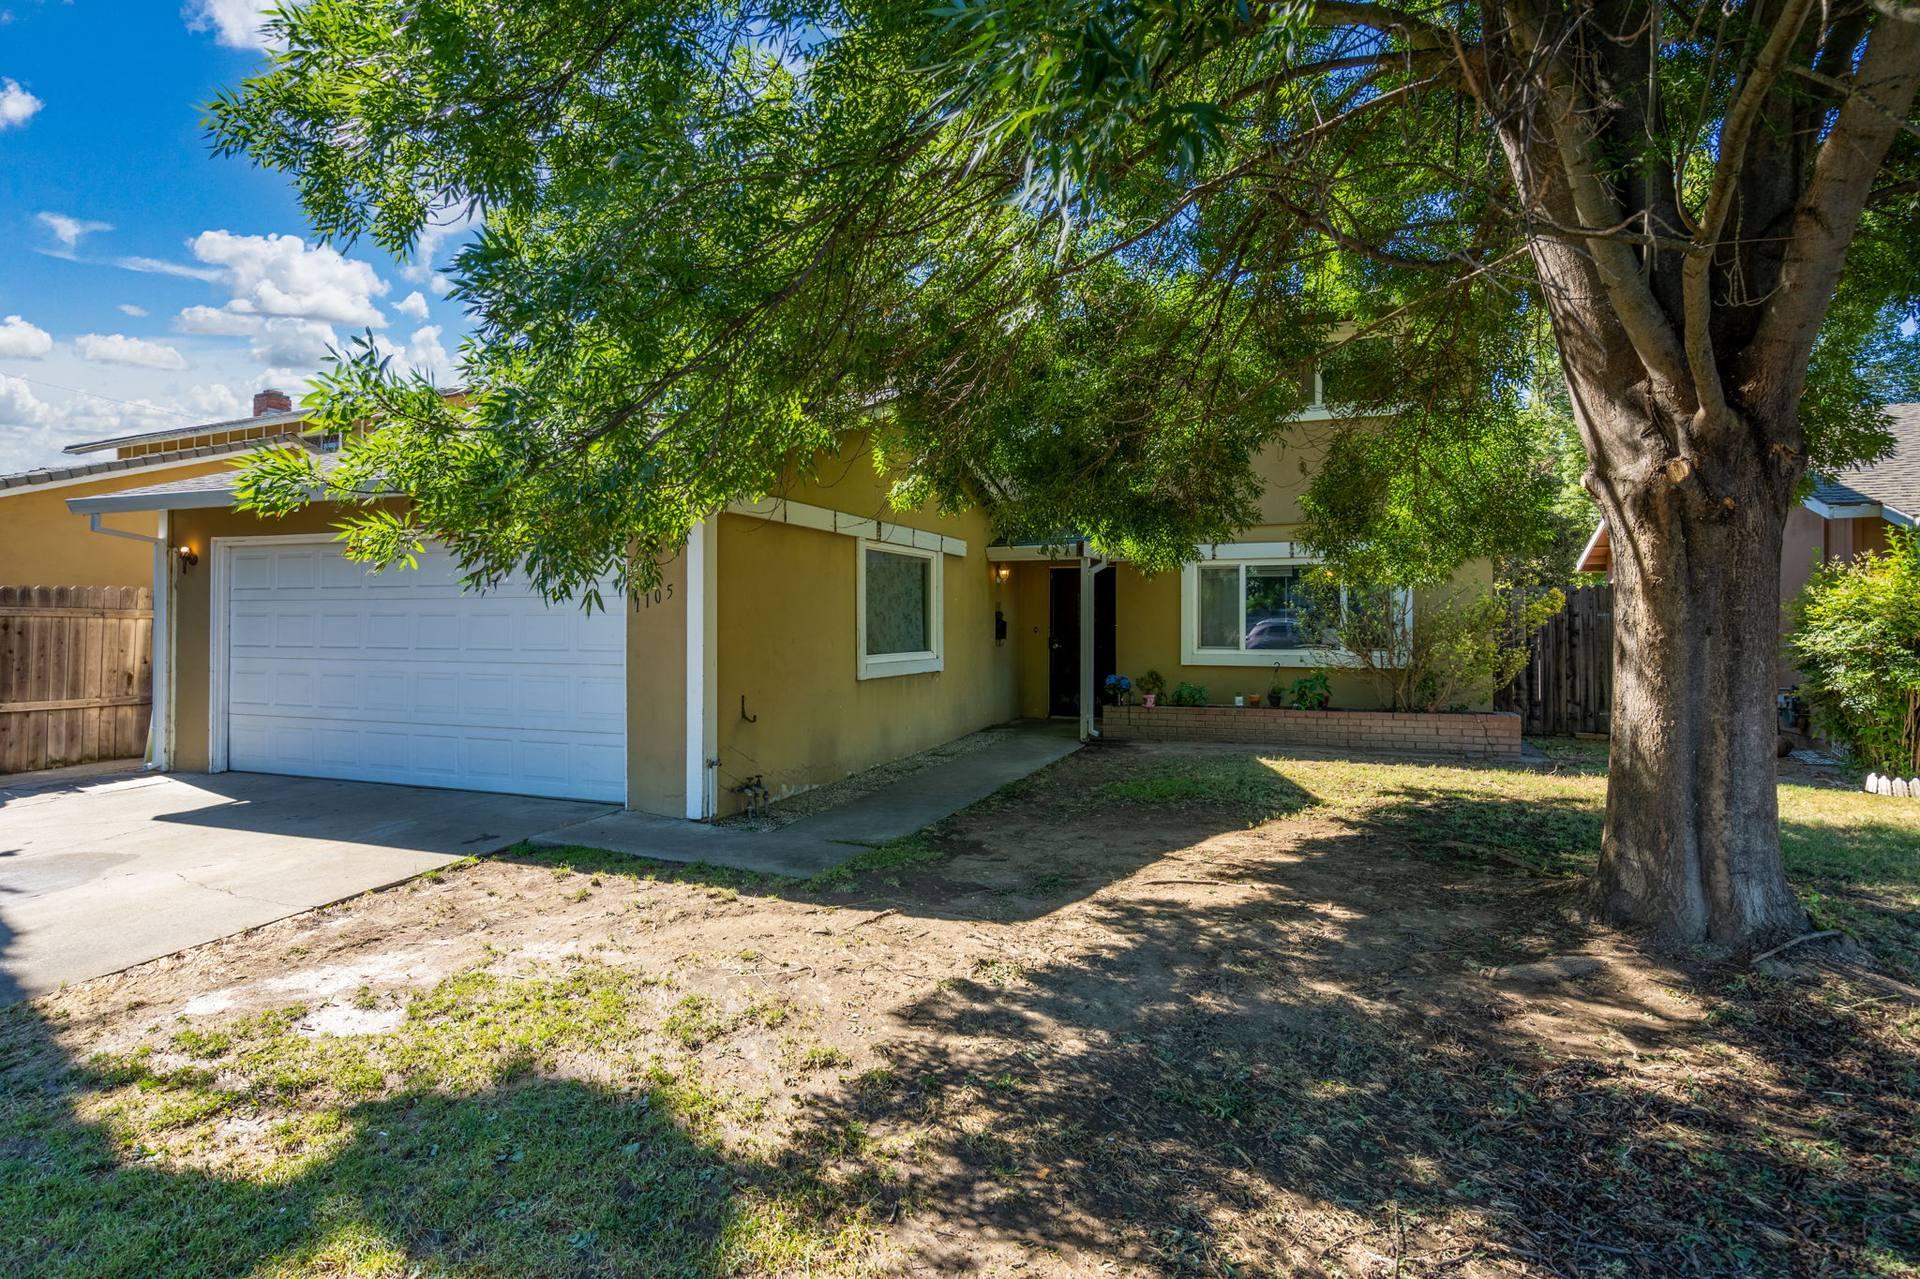 1105 Charles St, West Sacramento, CA 95605, US